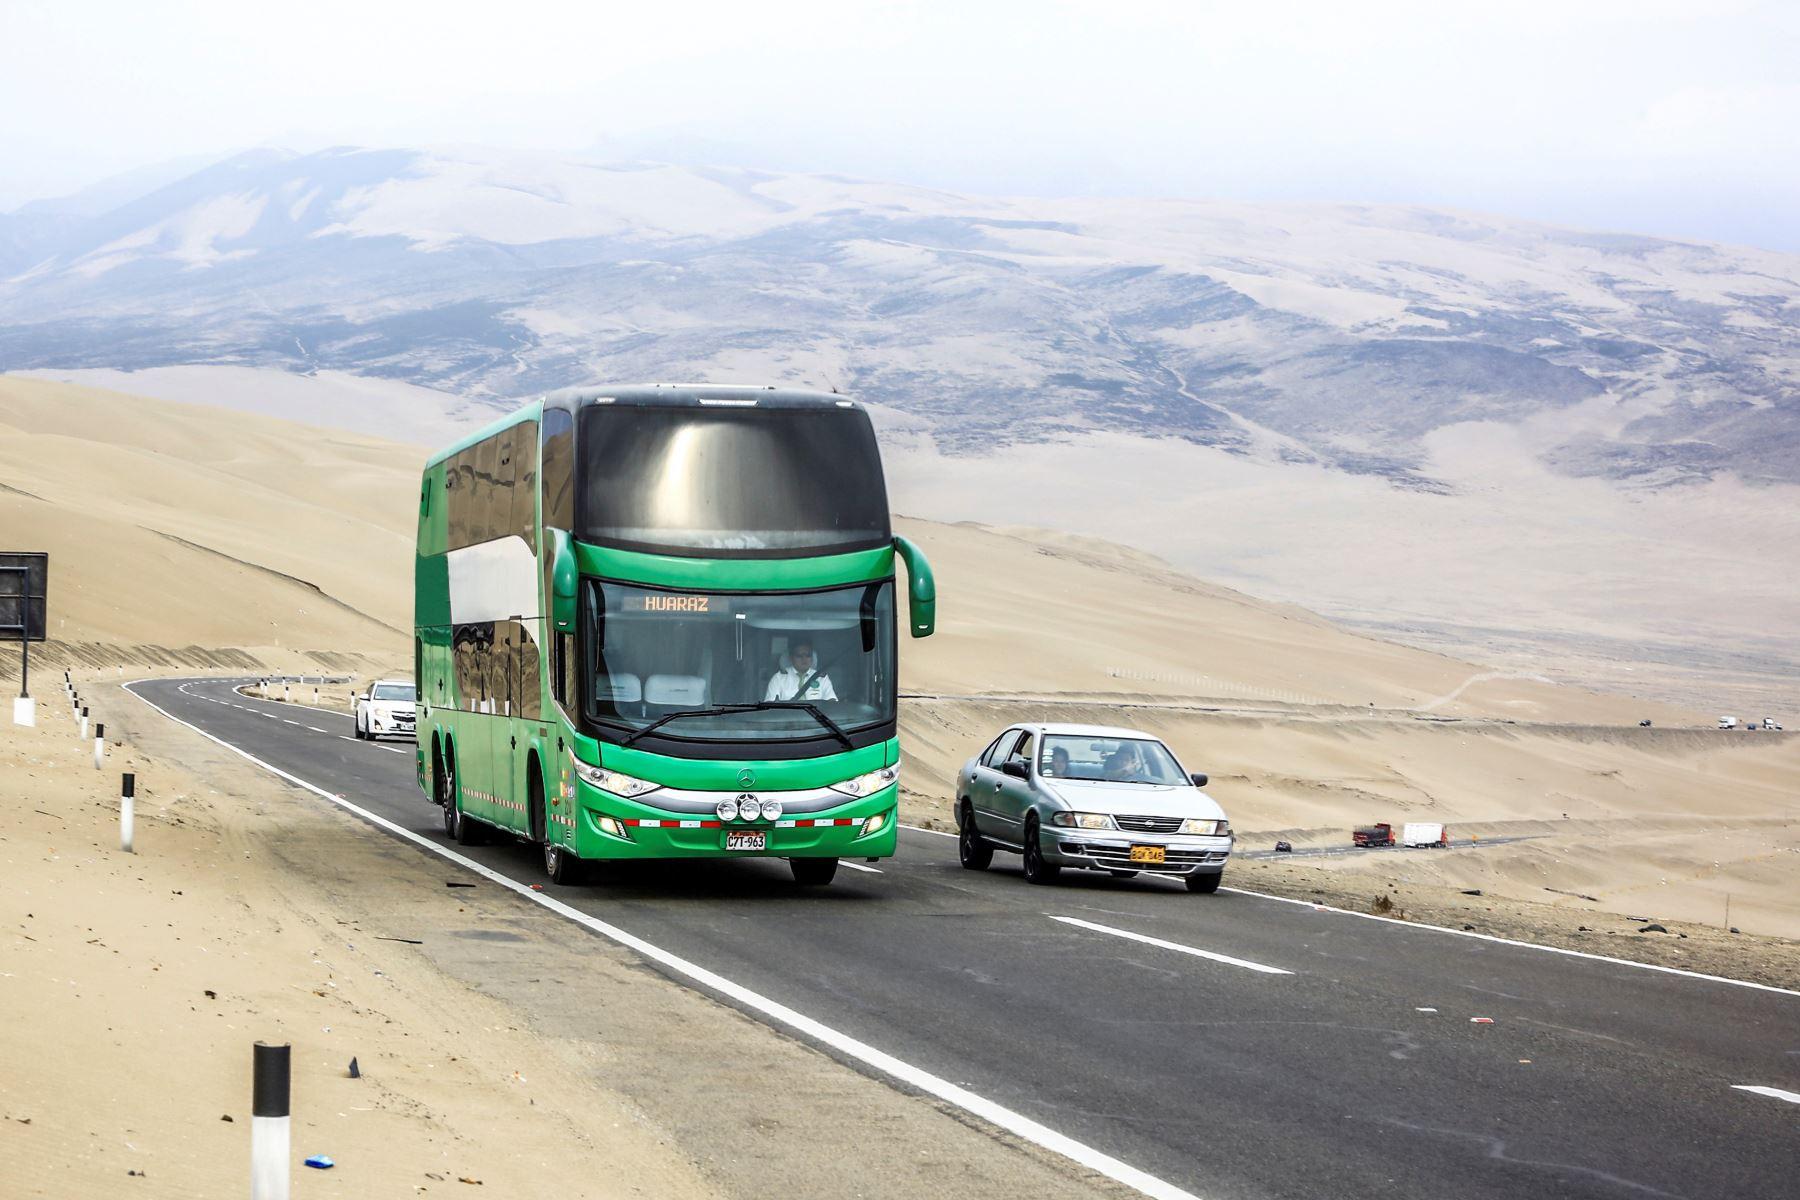 gobierno-analiza-aplicar-subsidios-o-reducir-isc-para-empresas-de-transporte-terrestre